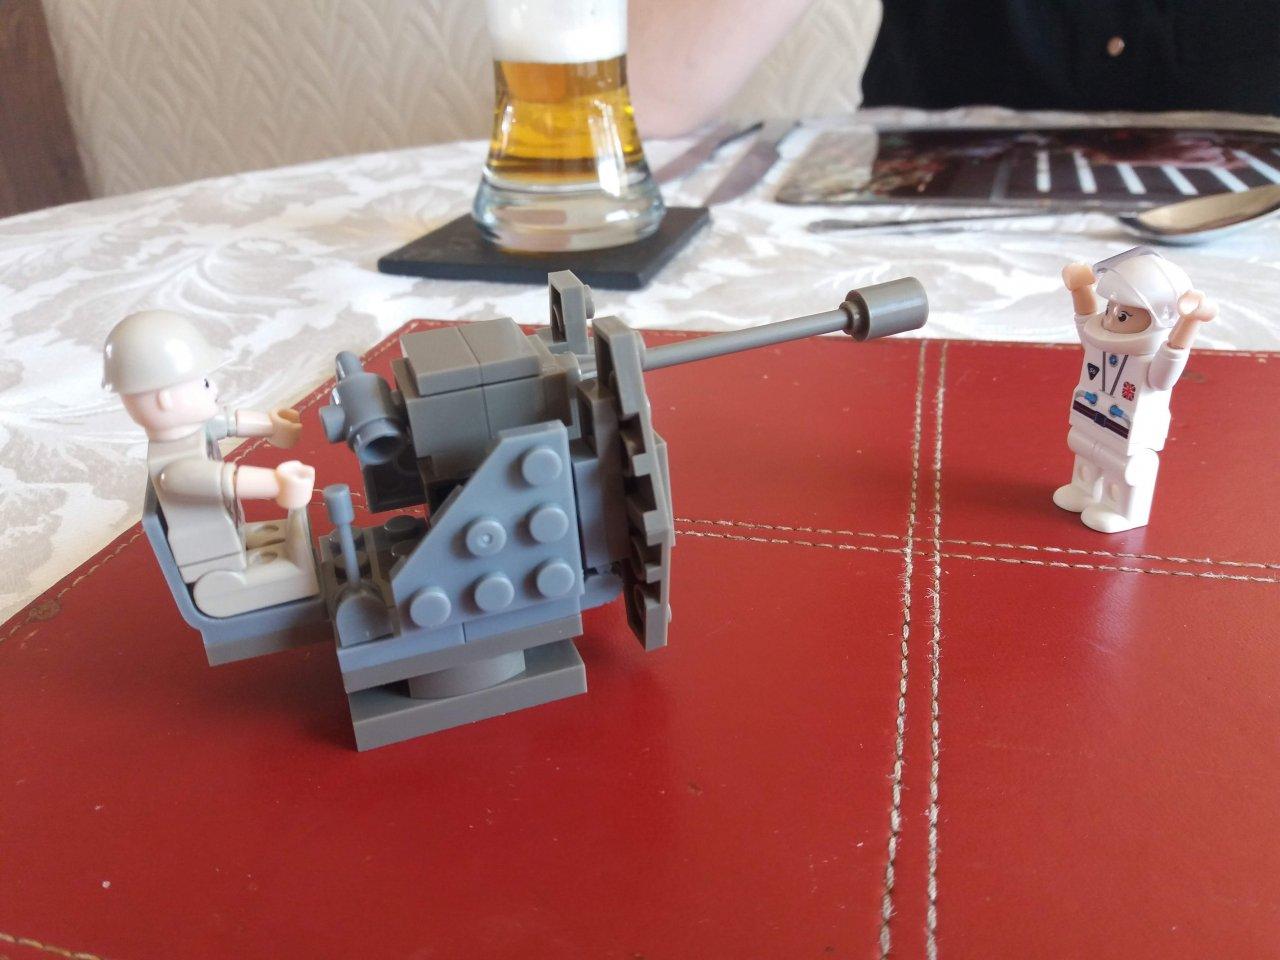 North Korean Lego